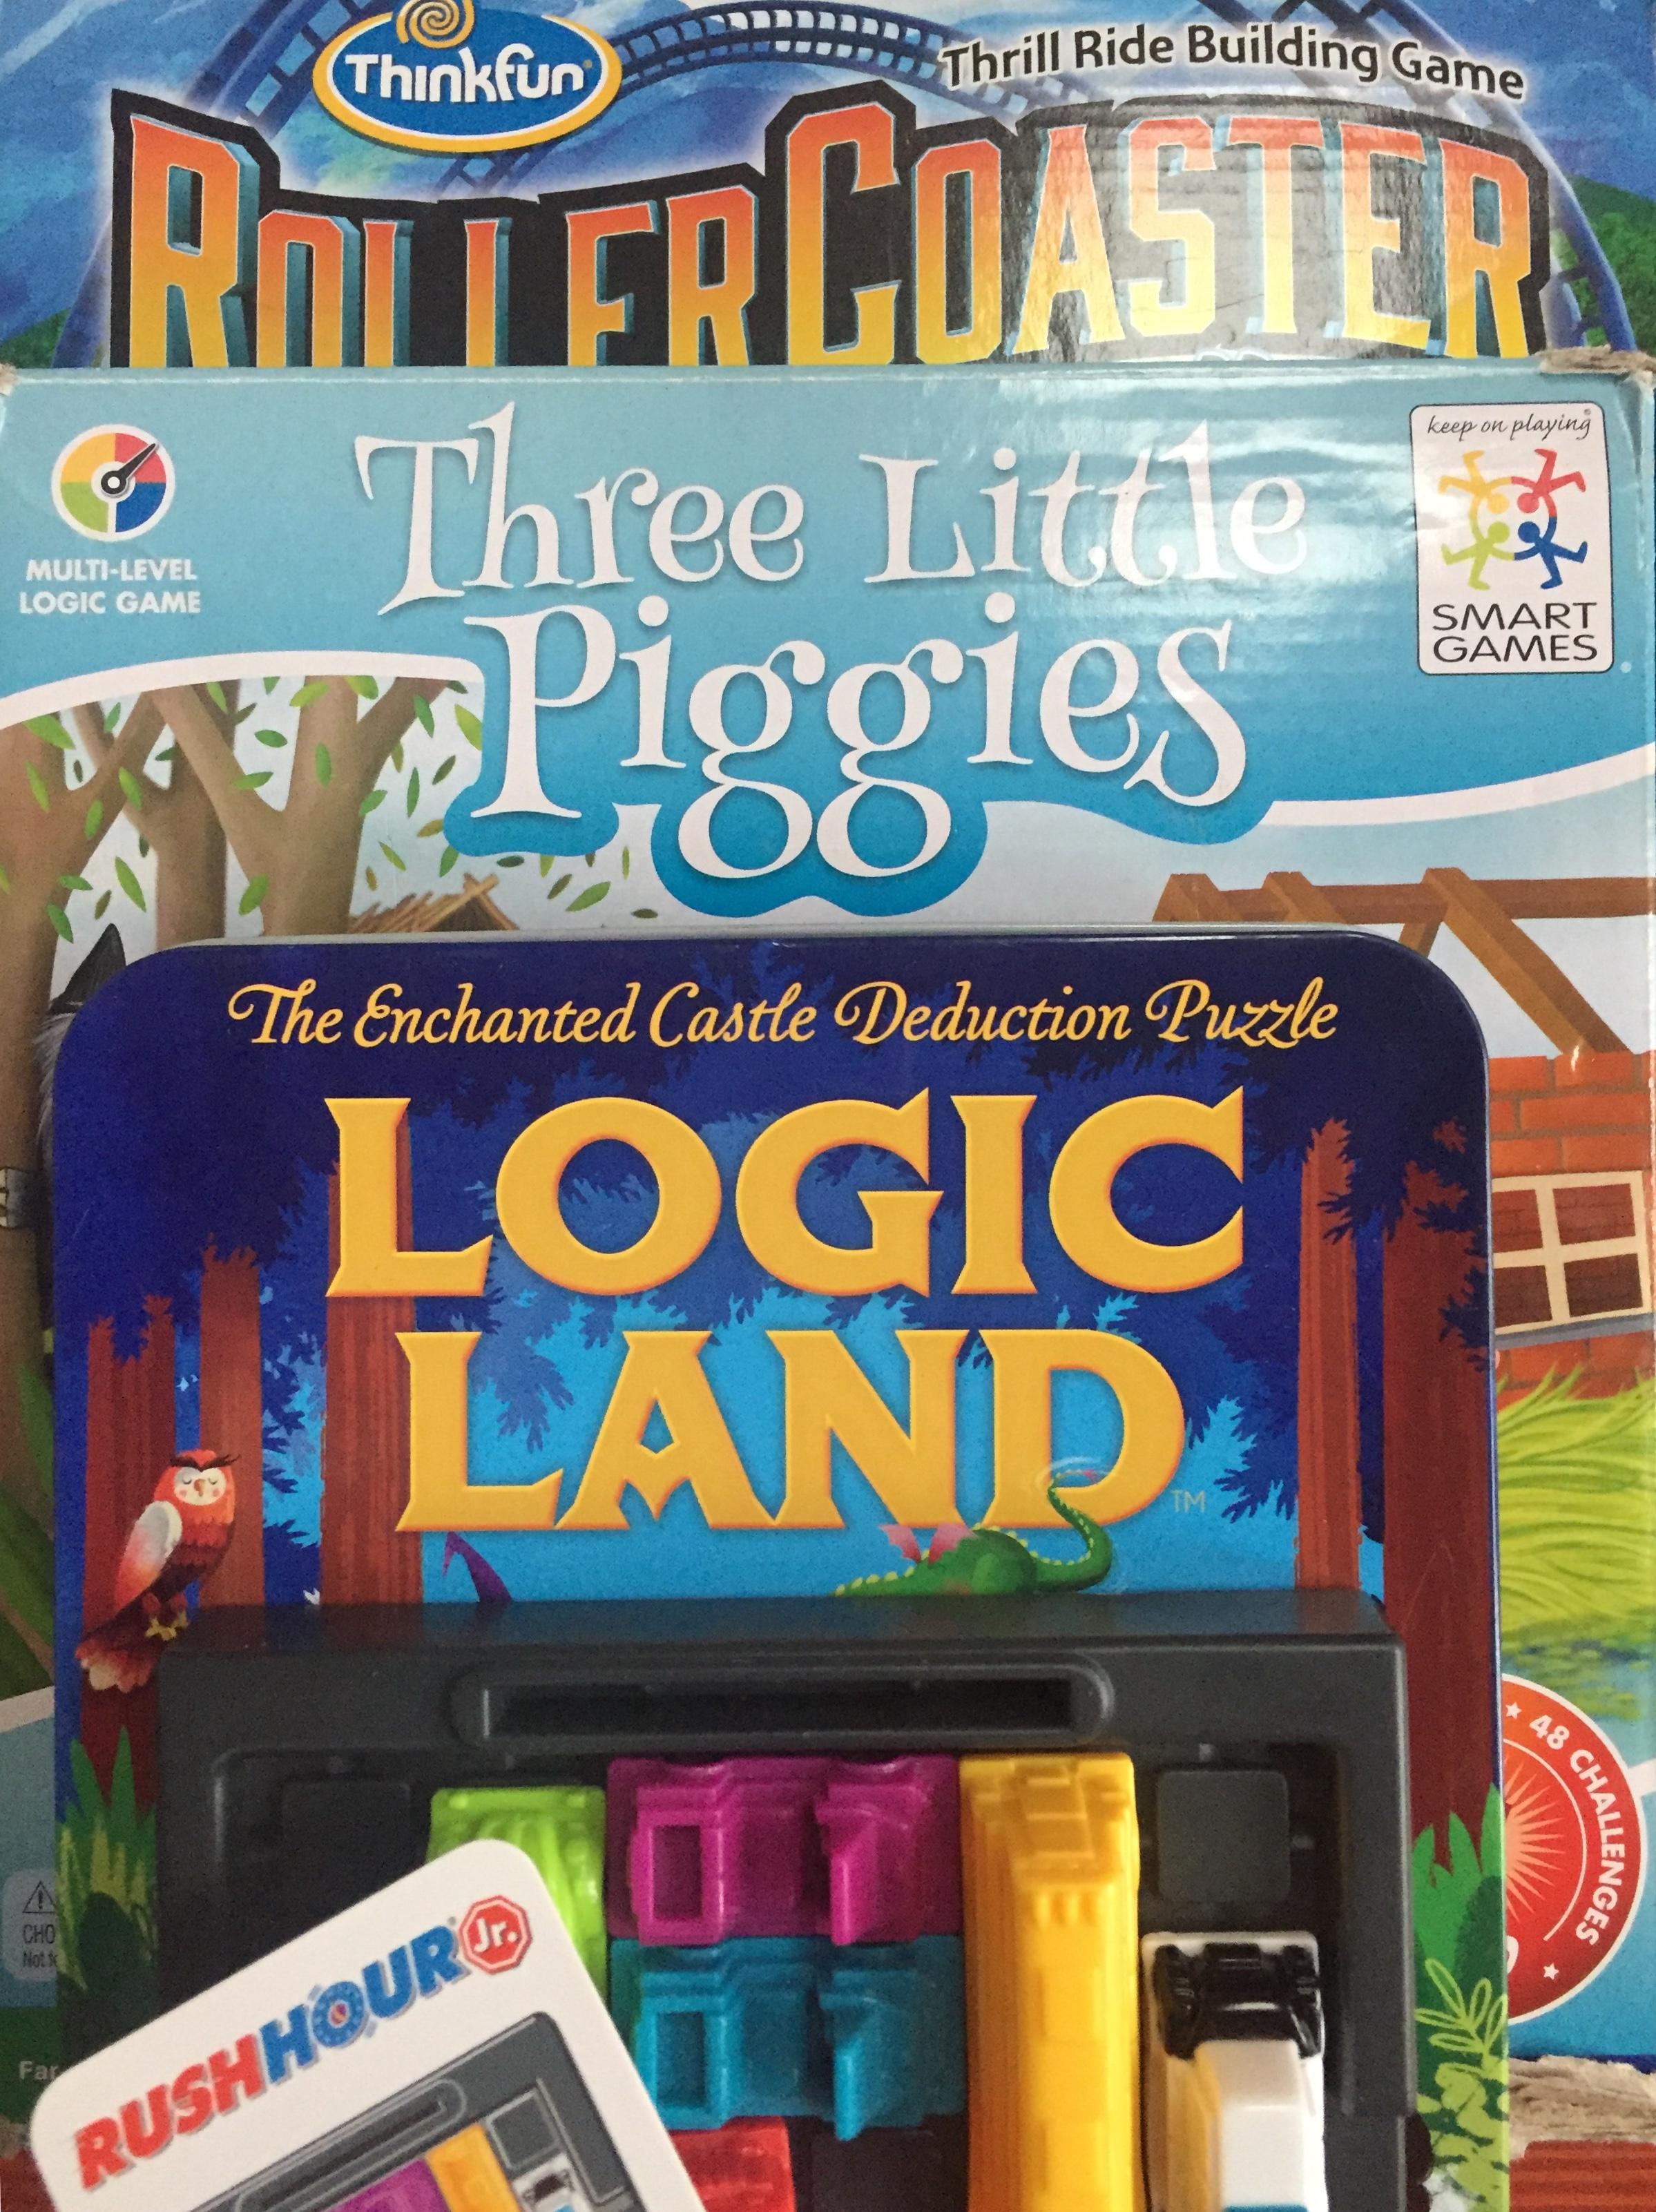 Logic puzzles for kids Roller Coaster Challenge Three Little Piggies Logic Land Castle and Rush Hour Jr